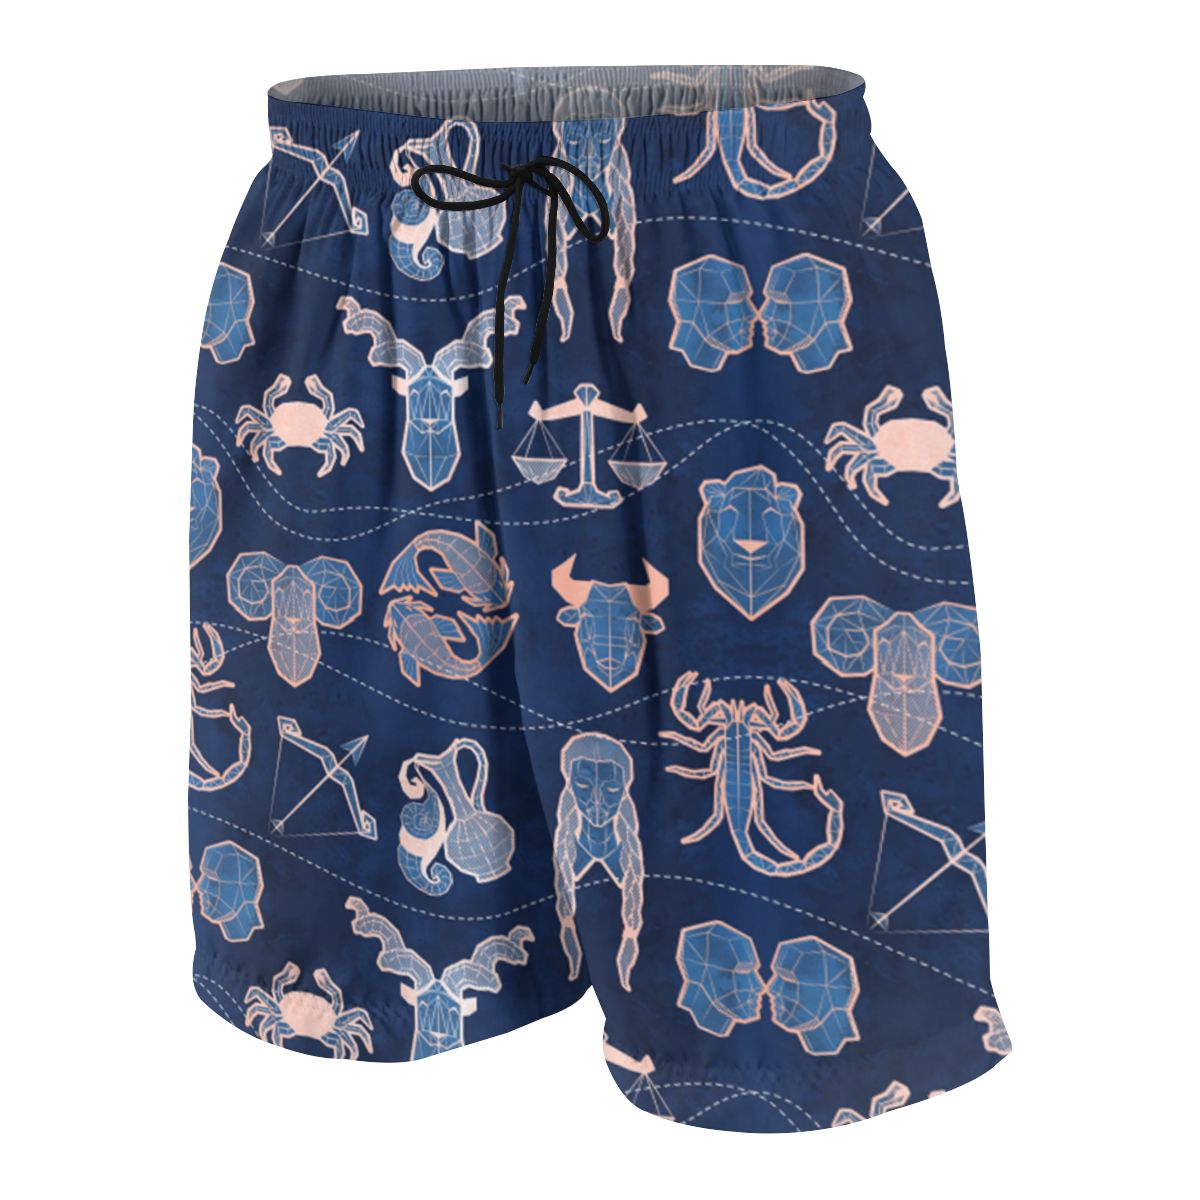 NOISYDESIGNS Geometric Navy Blue Coral Animals Shorts 3D Board Trunks 2020 Summer Teen Boys Hip Hop Short Pants Beach Wear Boy